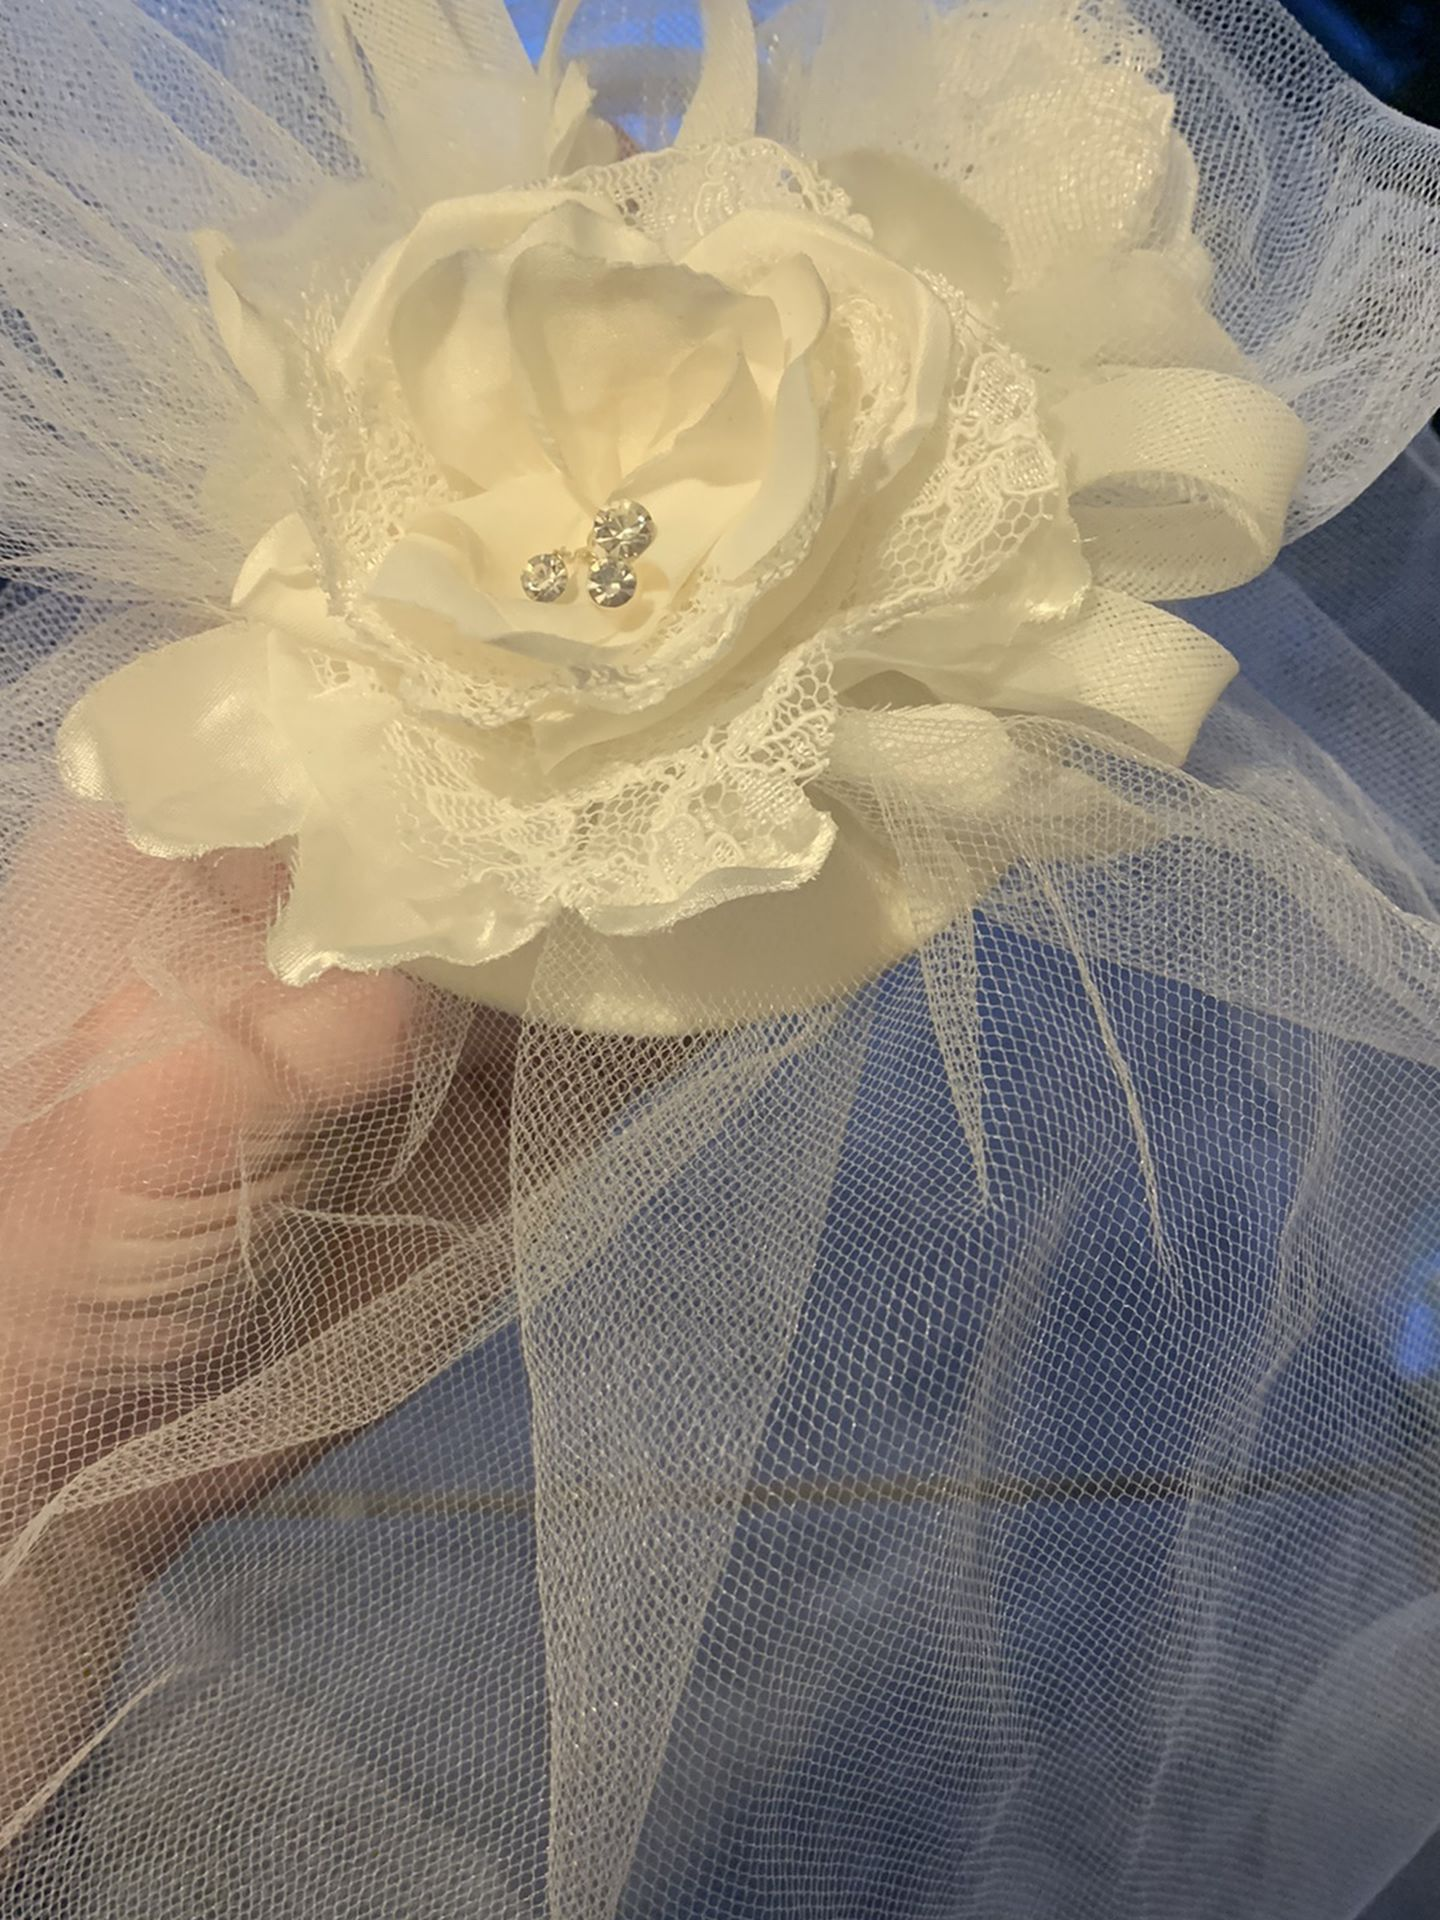 Birdcage Veil From David's Bridal